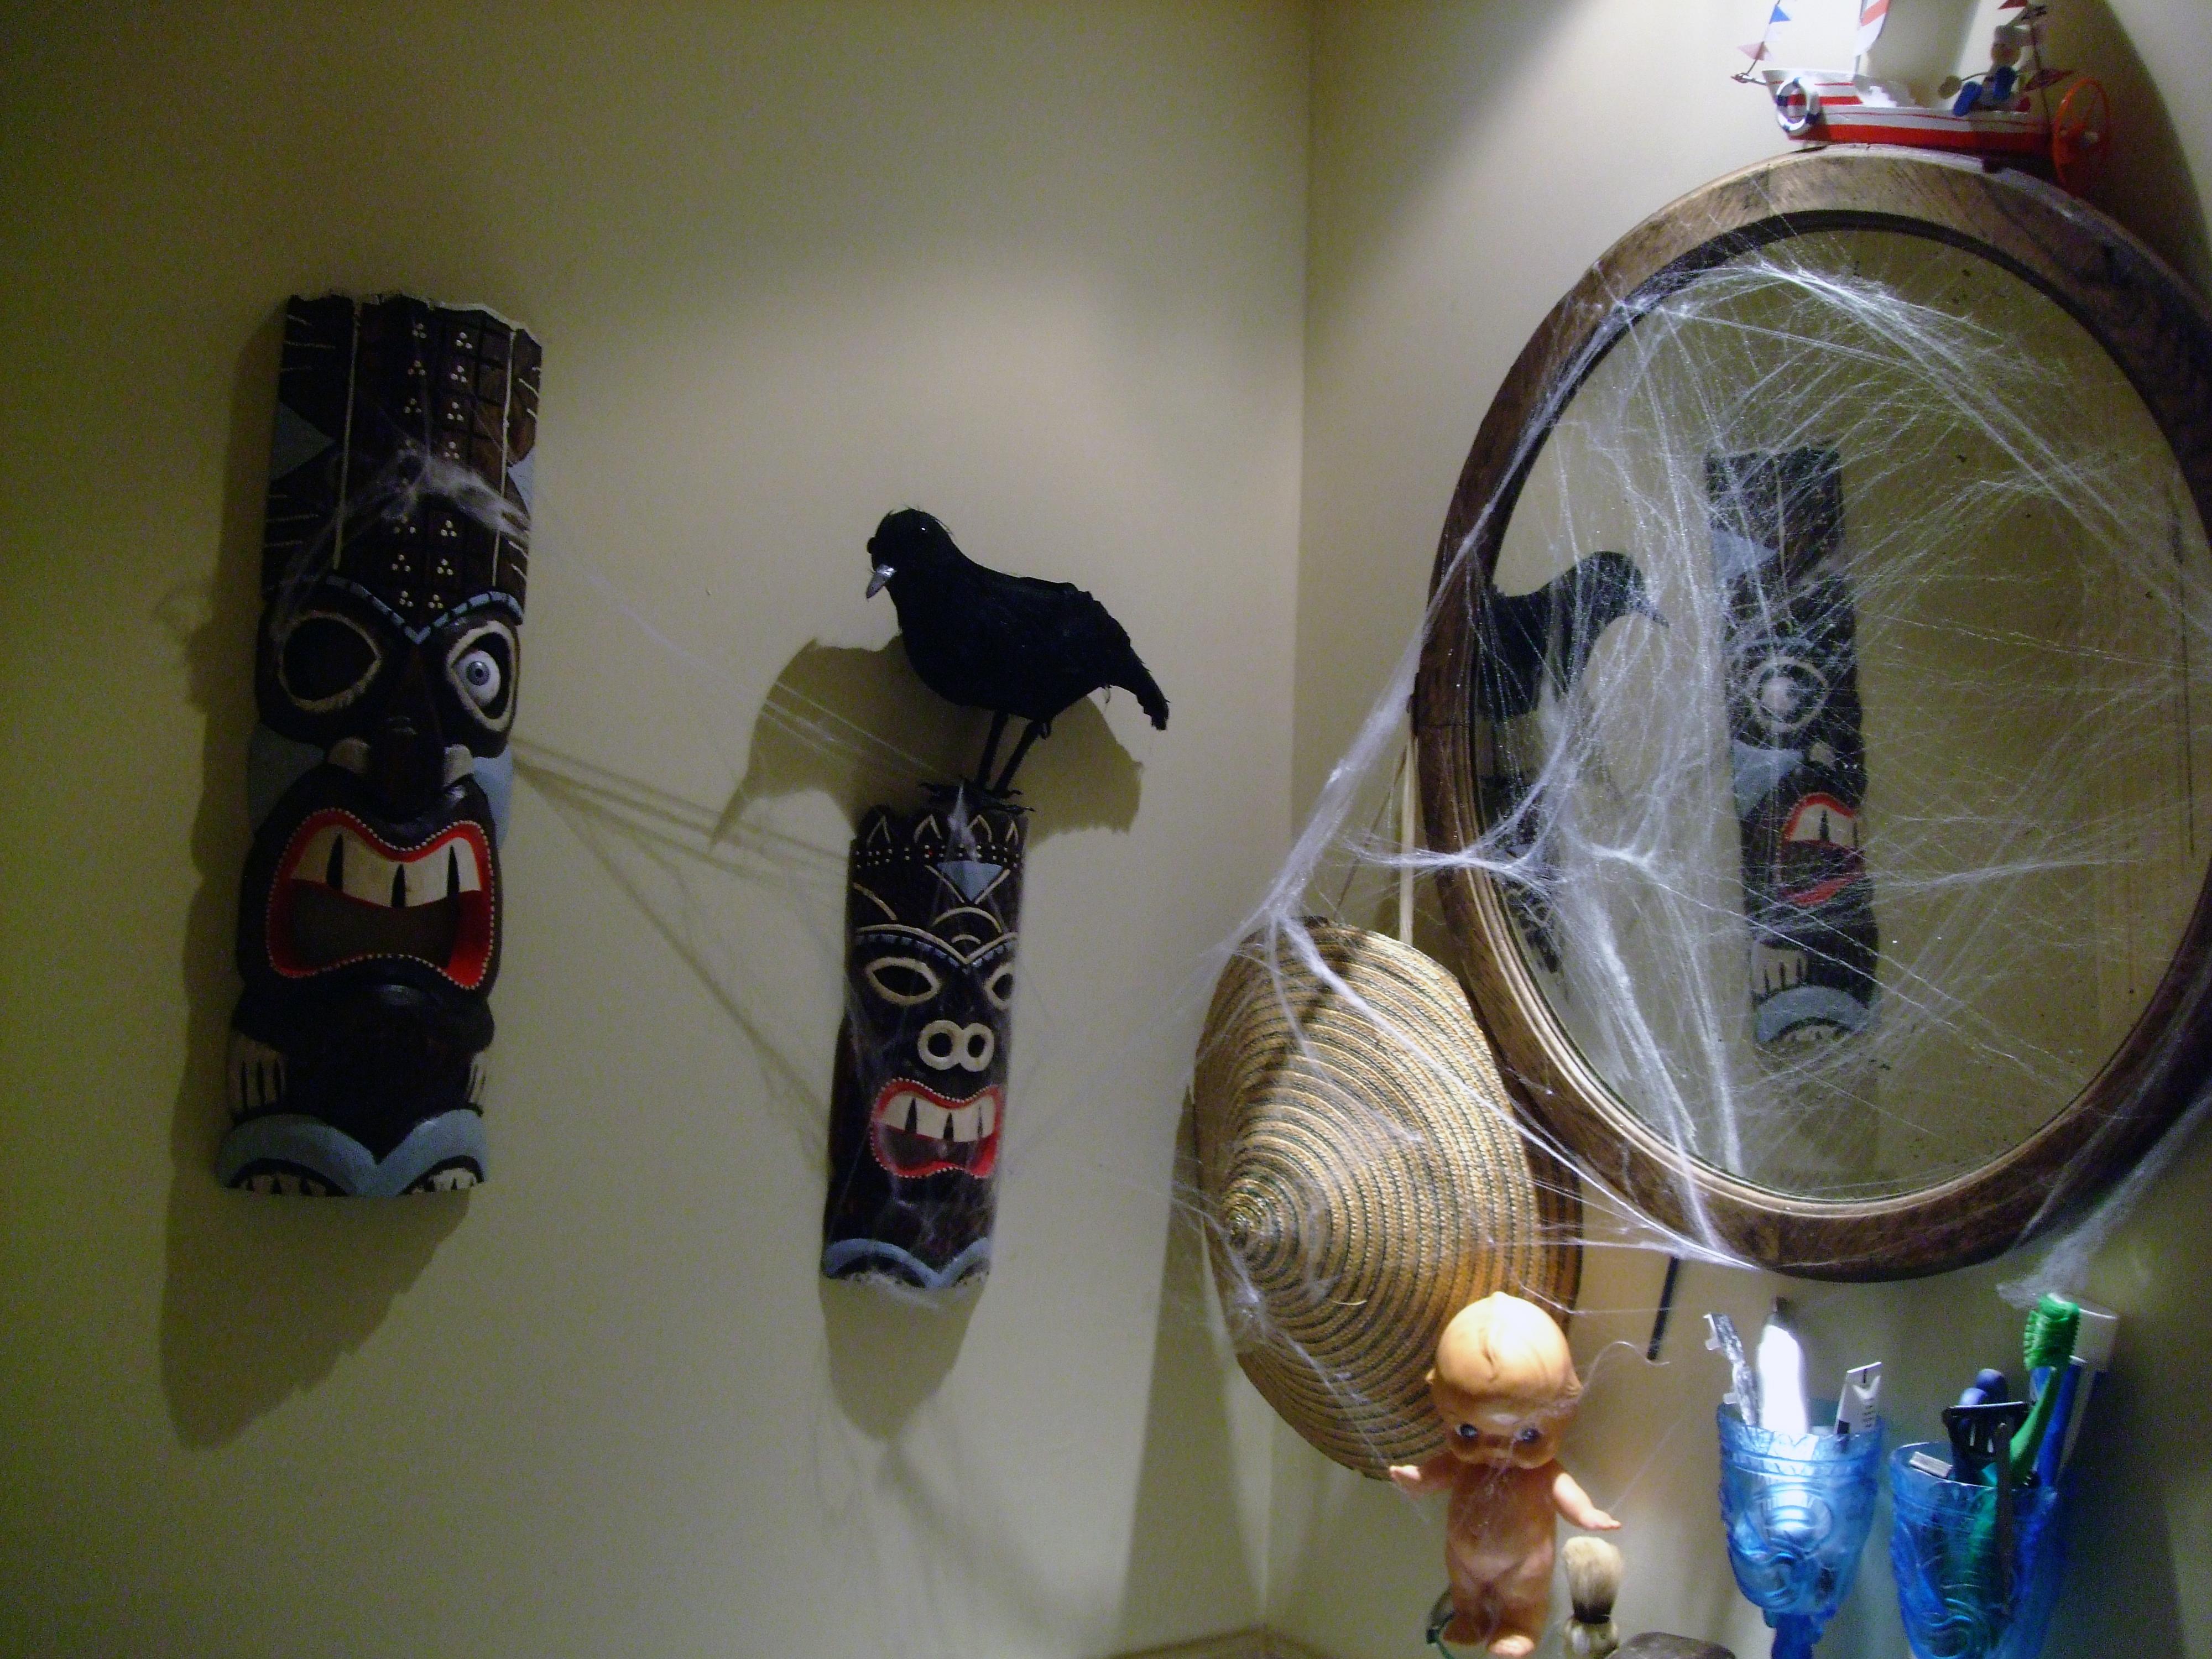 Halloween Bathroom Accessories Corpse Bride Costume 1940s Pin Up Entertainer Kitten Von Mew